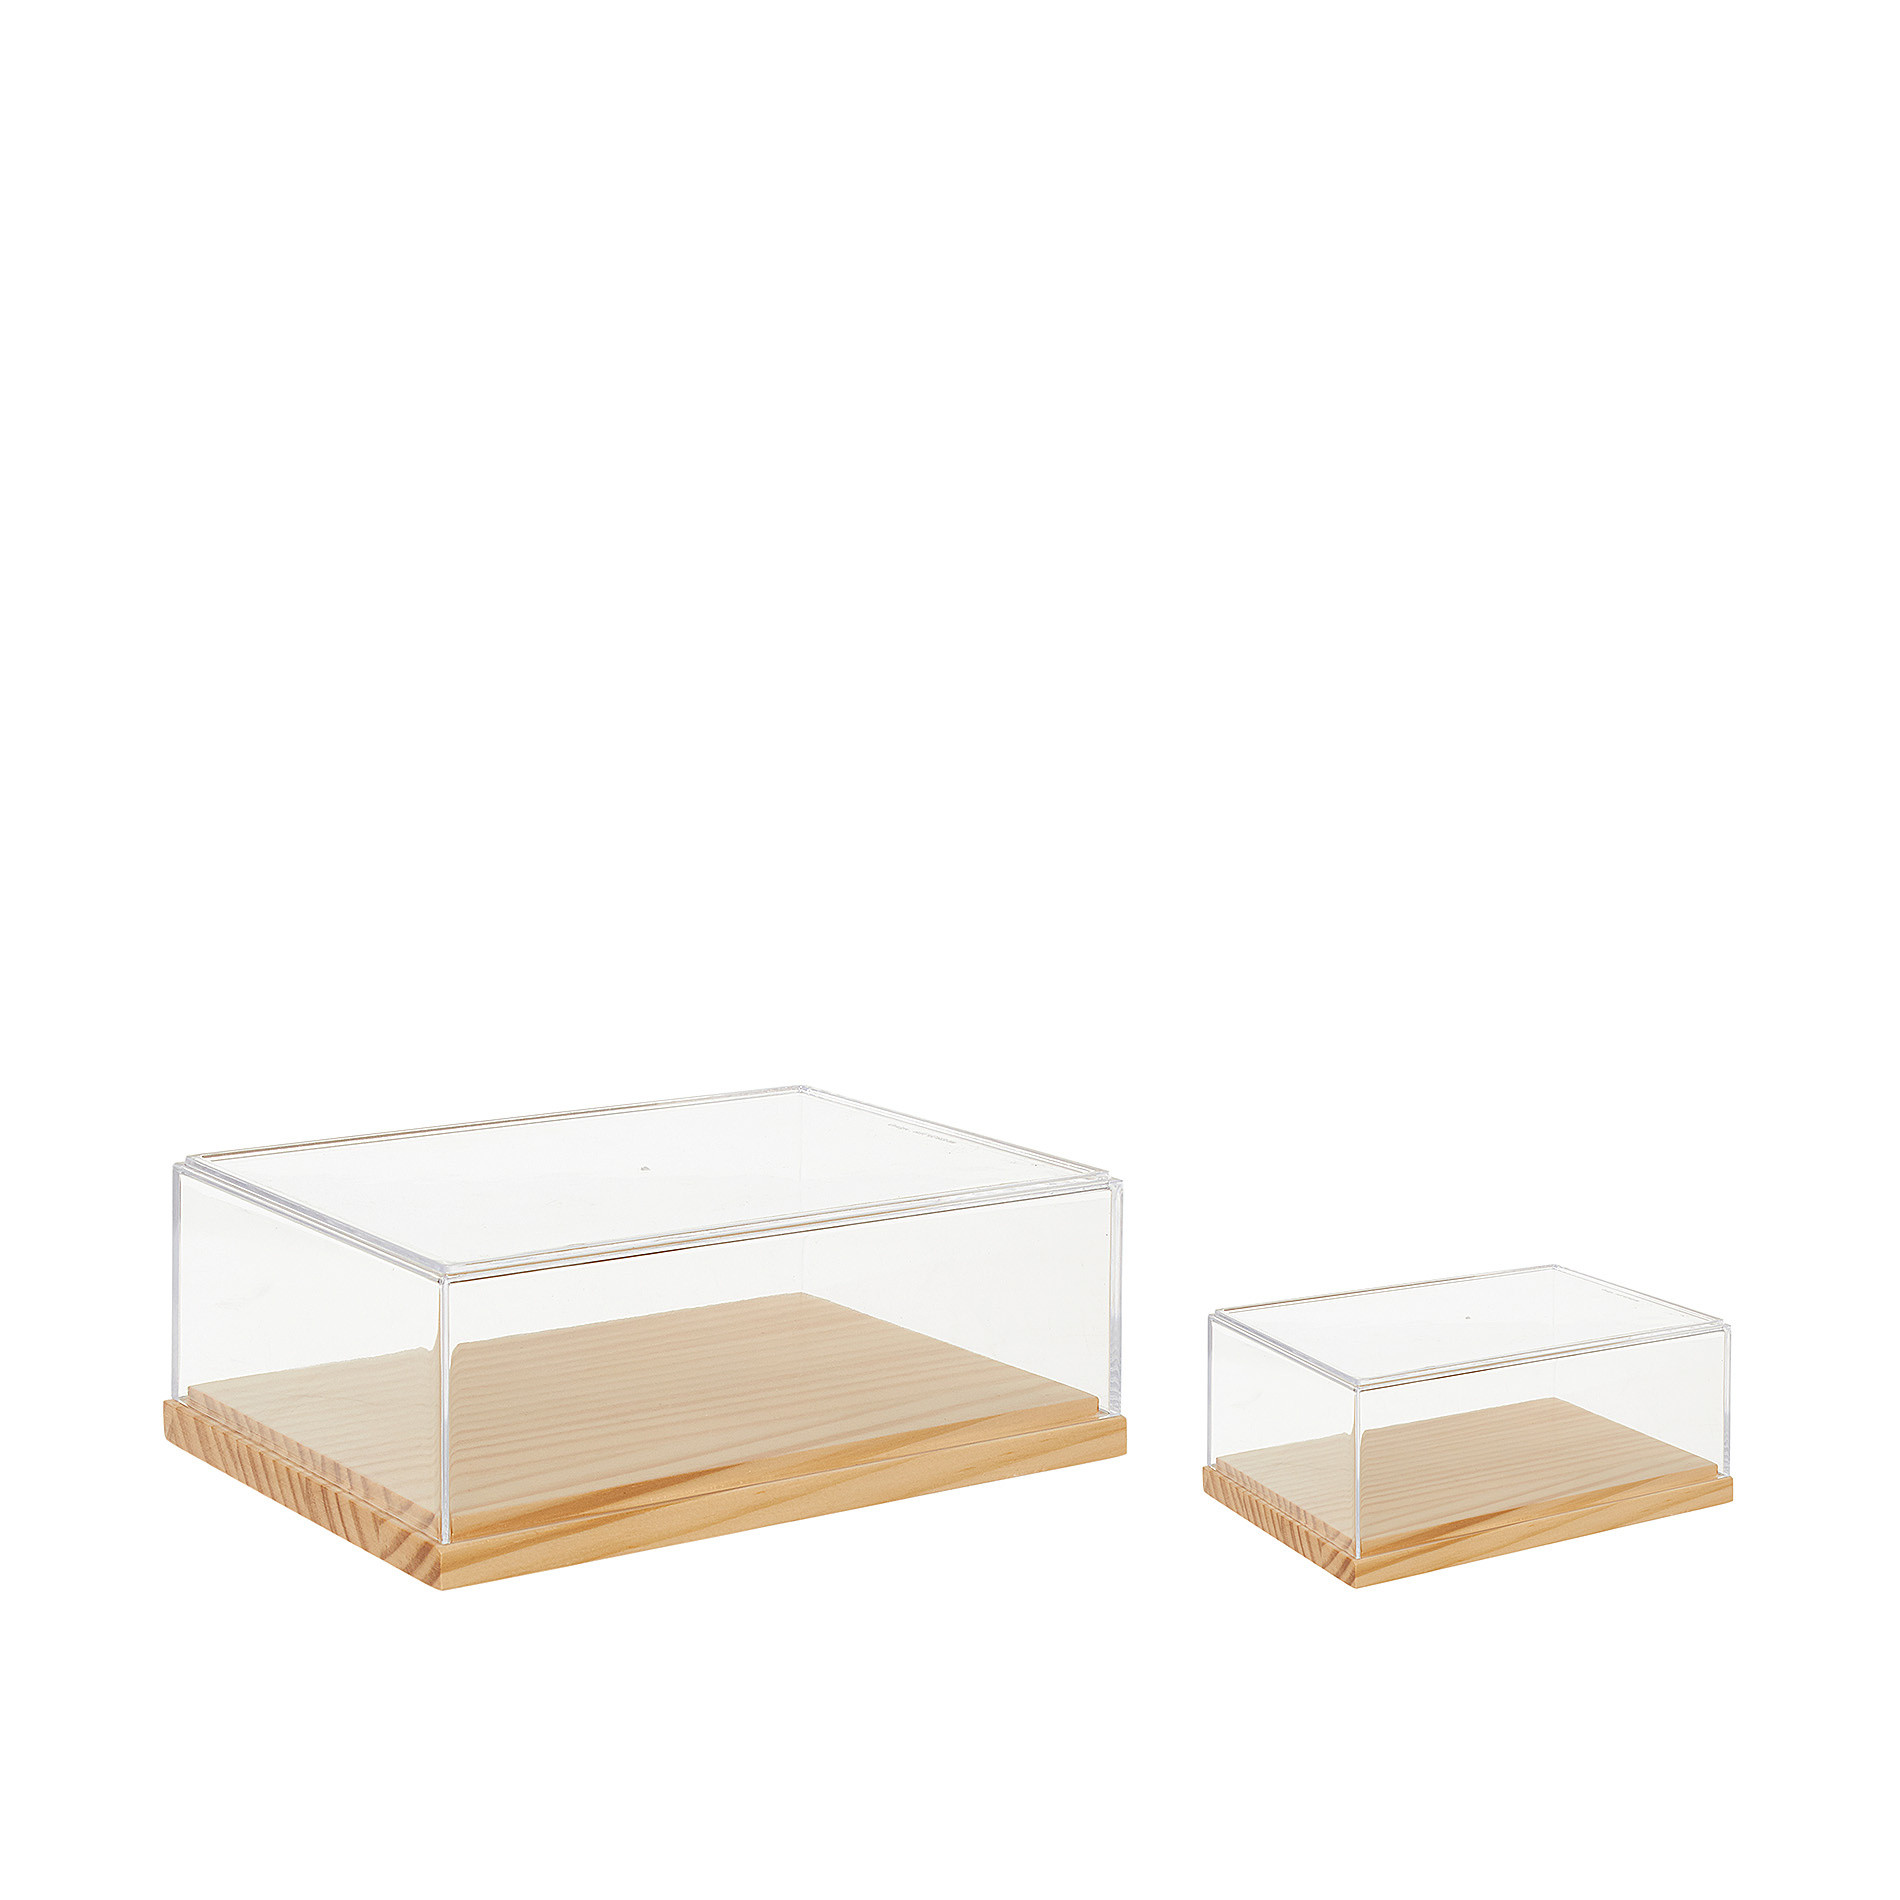 Box in plexiglass e bamboo, Trasparente, large image number 1